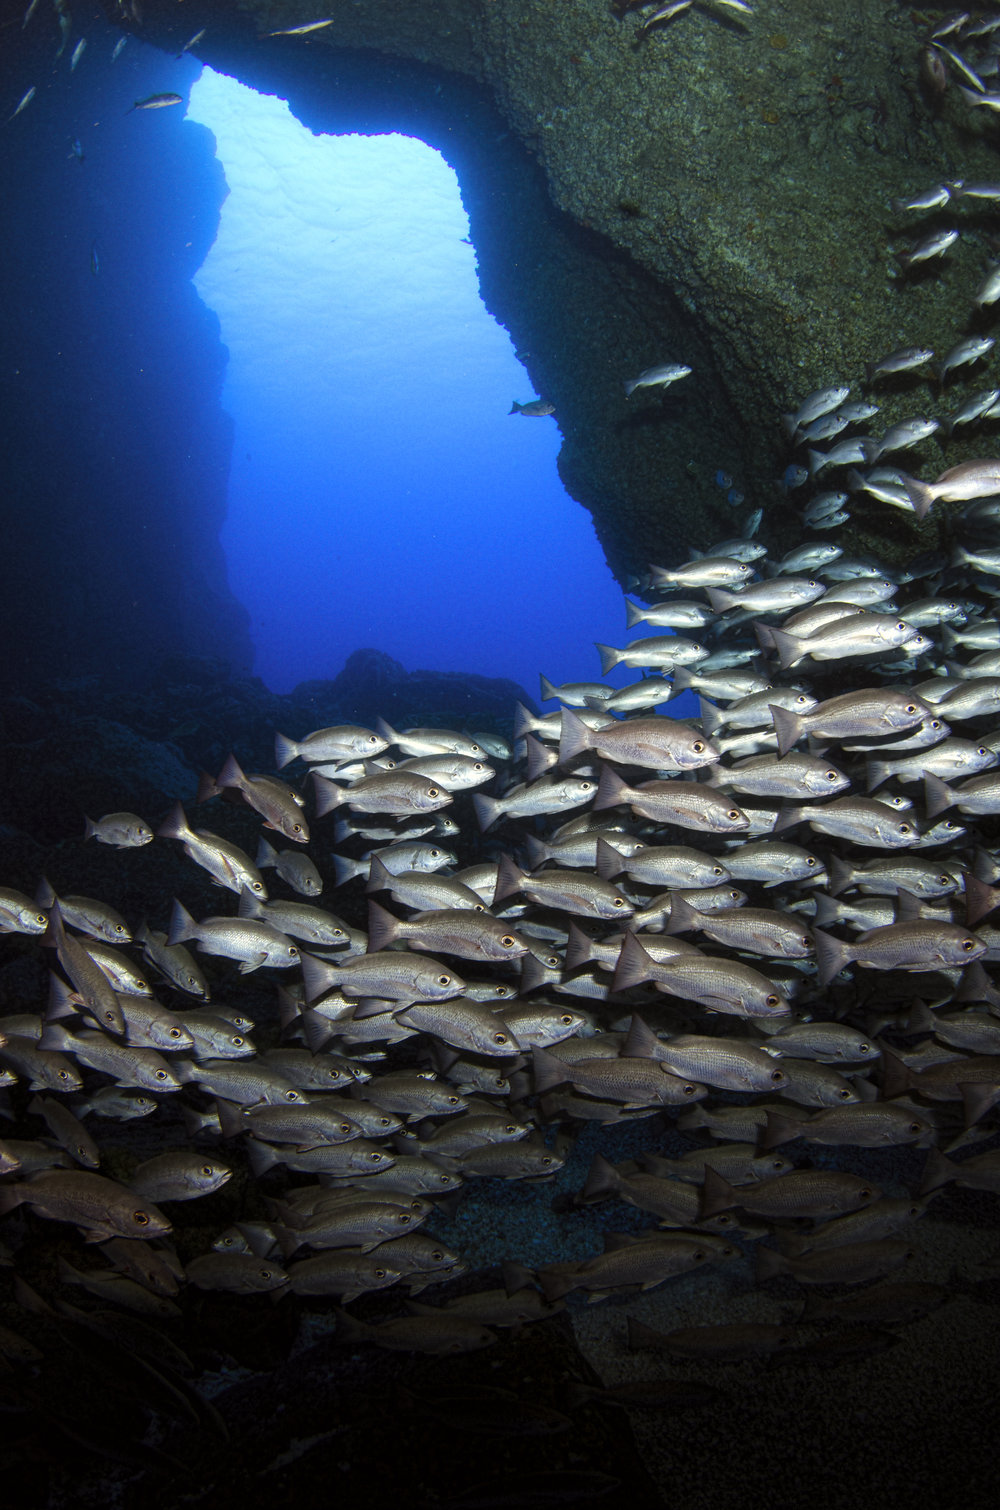 school swimming amanda cotton / coral reef image bank